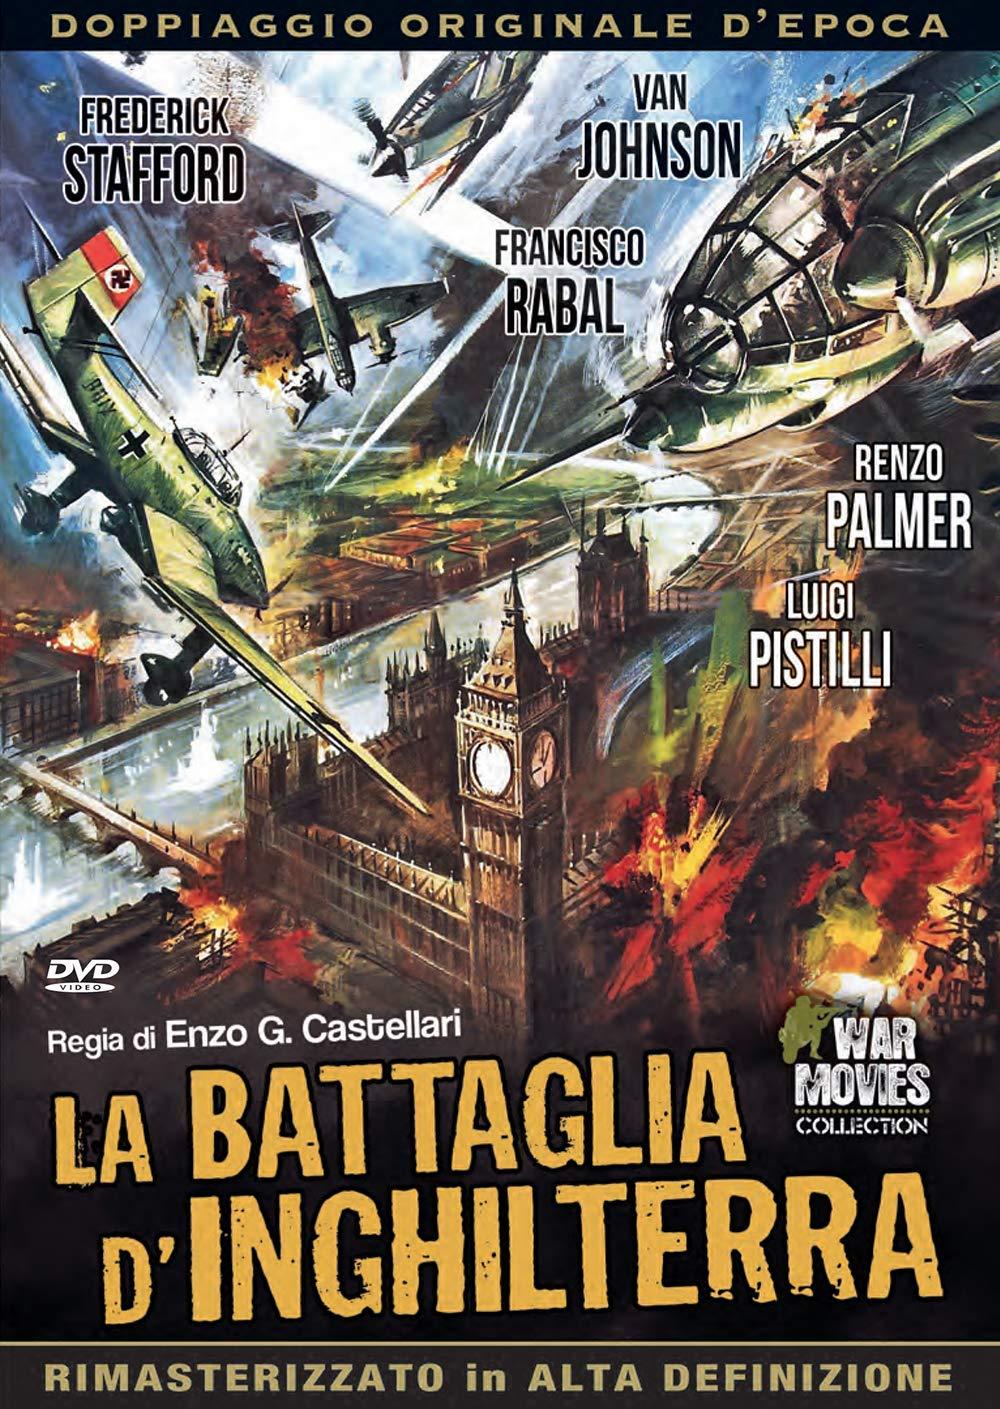 LA BATTAGLIA D'INGHILTERRA (DVD)